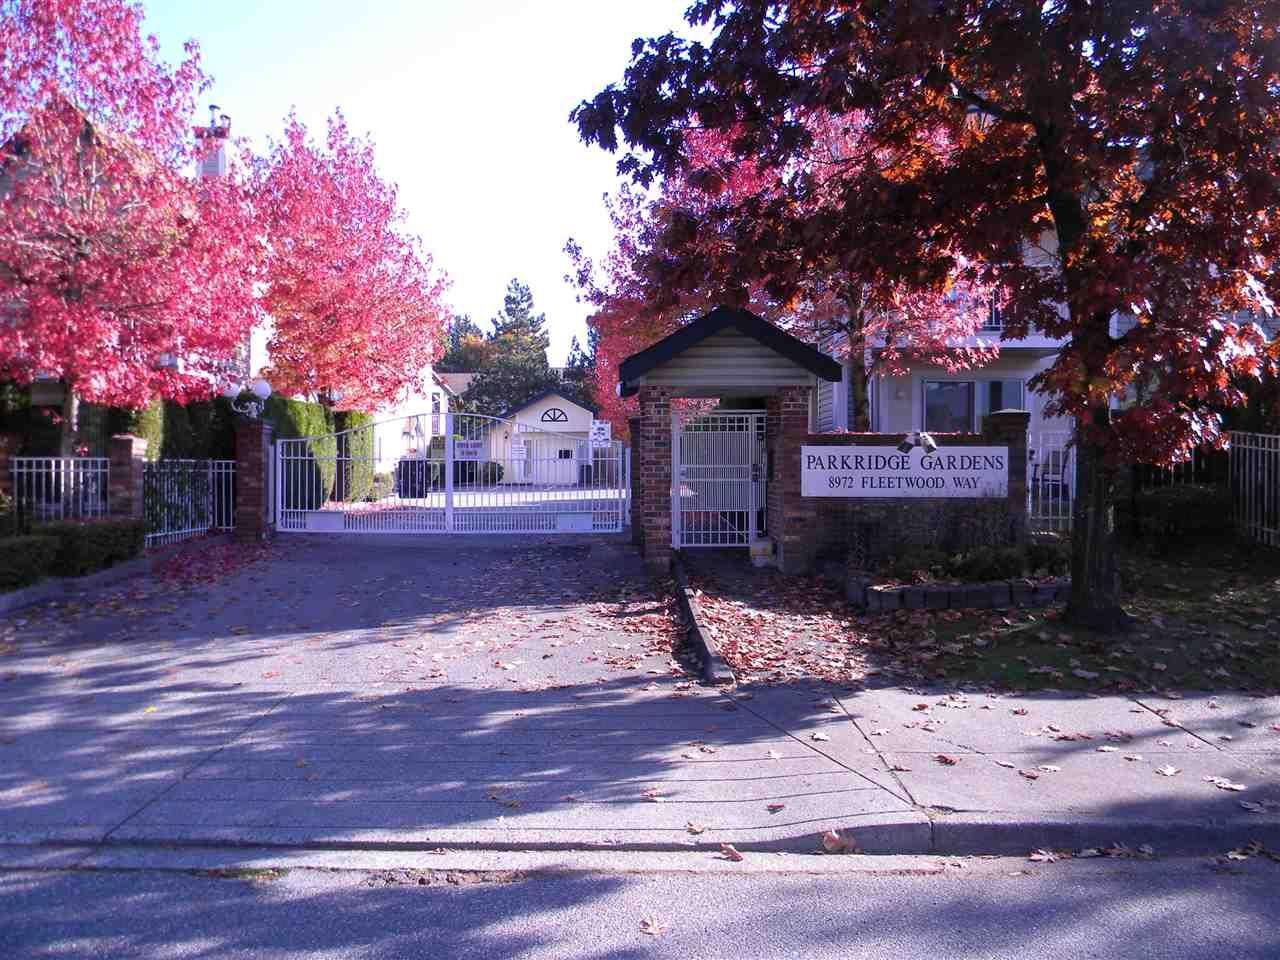 "Main Photo: 702 8972 FLEETWOOD Way in Surrey: Fleetwood Tynehead Townhouse for sale in ""Parkridge Gardens"" : MLS®# R2317979"